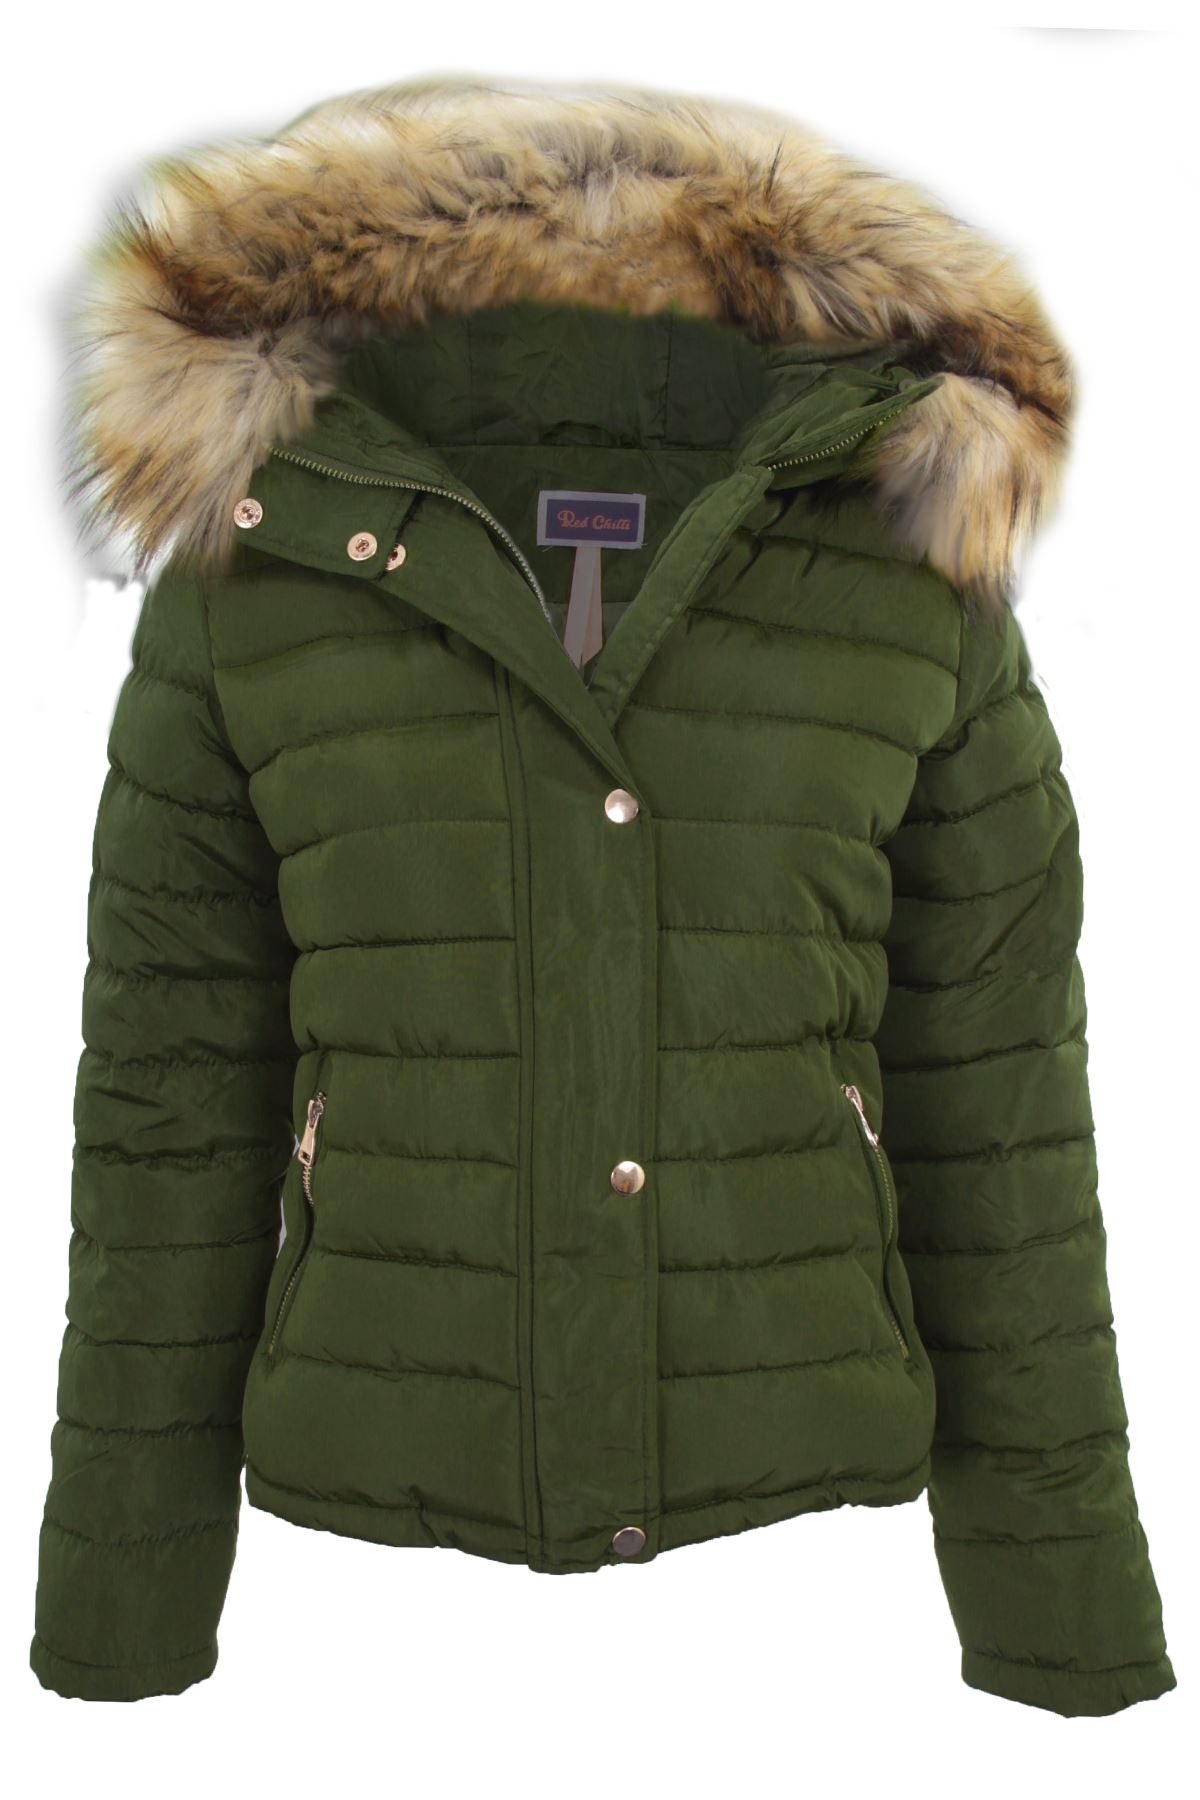 Womens Padded Detachable Fur Lined Hood Popper Zipper Puffer Jacket